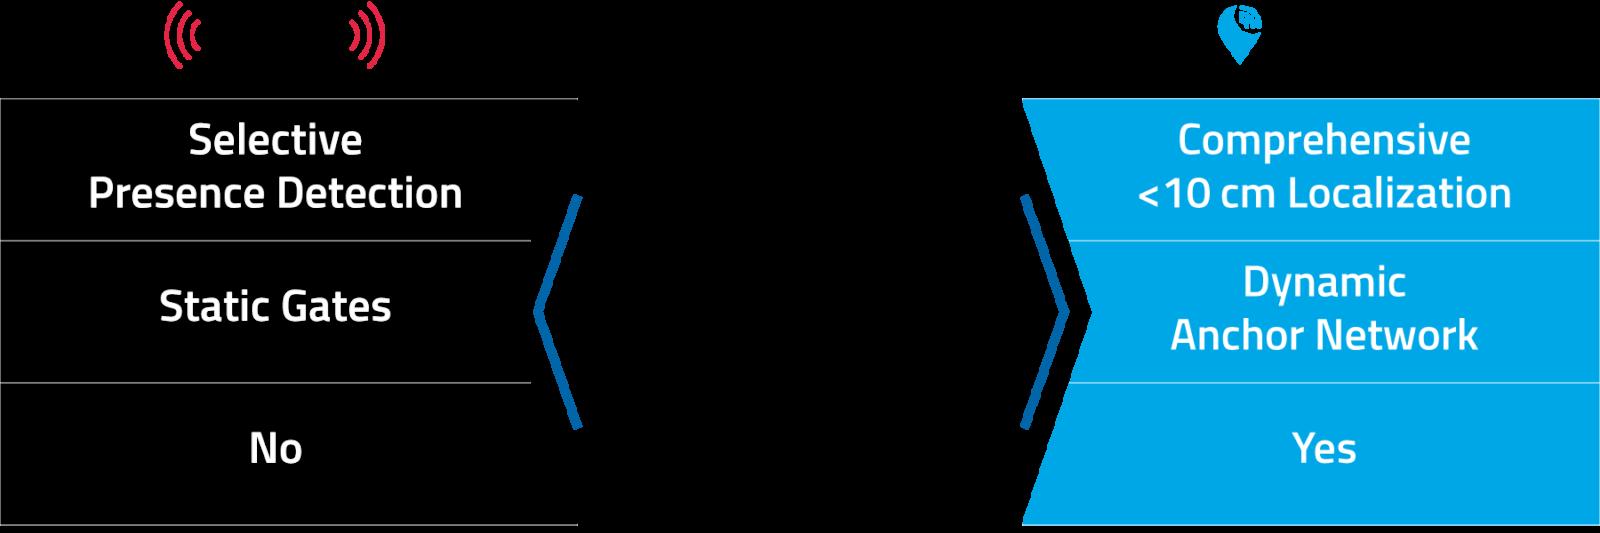 210723 RTLS RFID Comparison Use Cases Infographic 1 EN 2